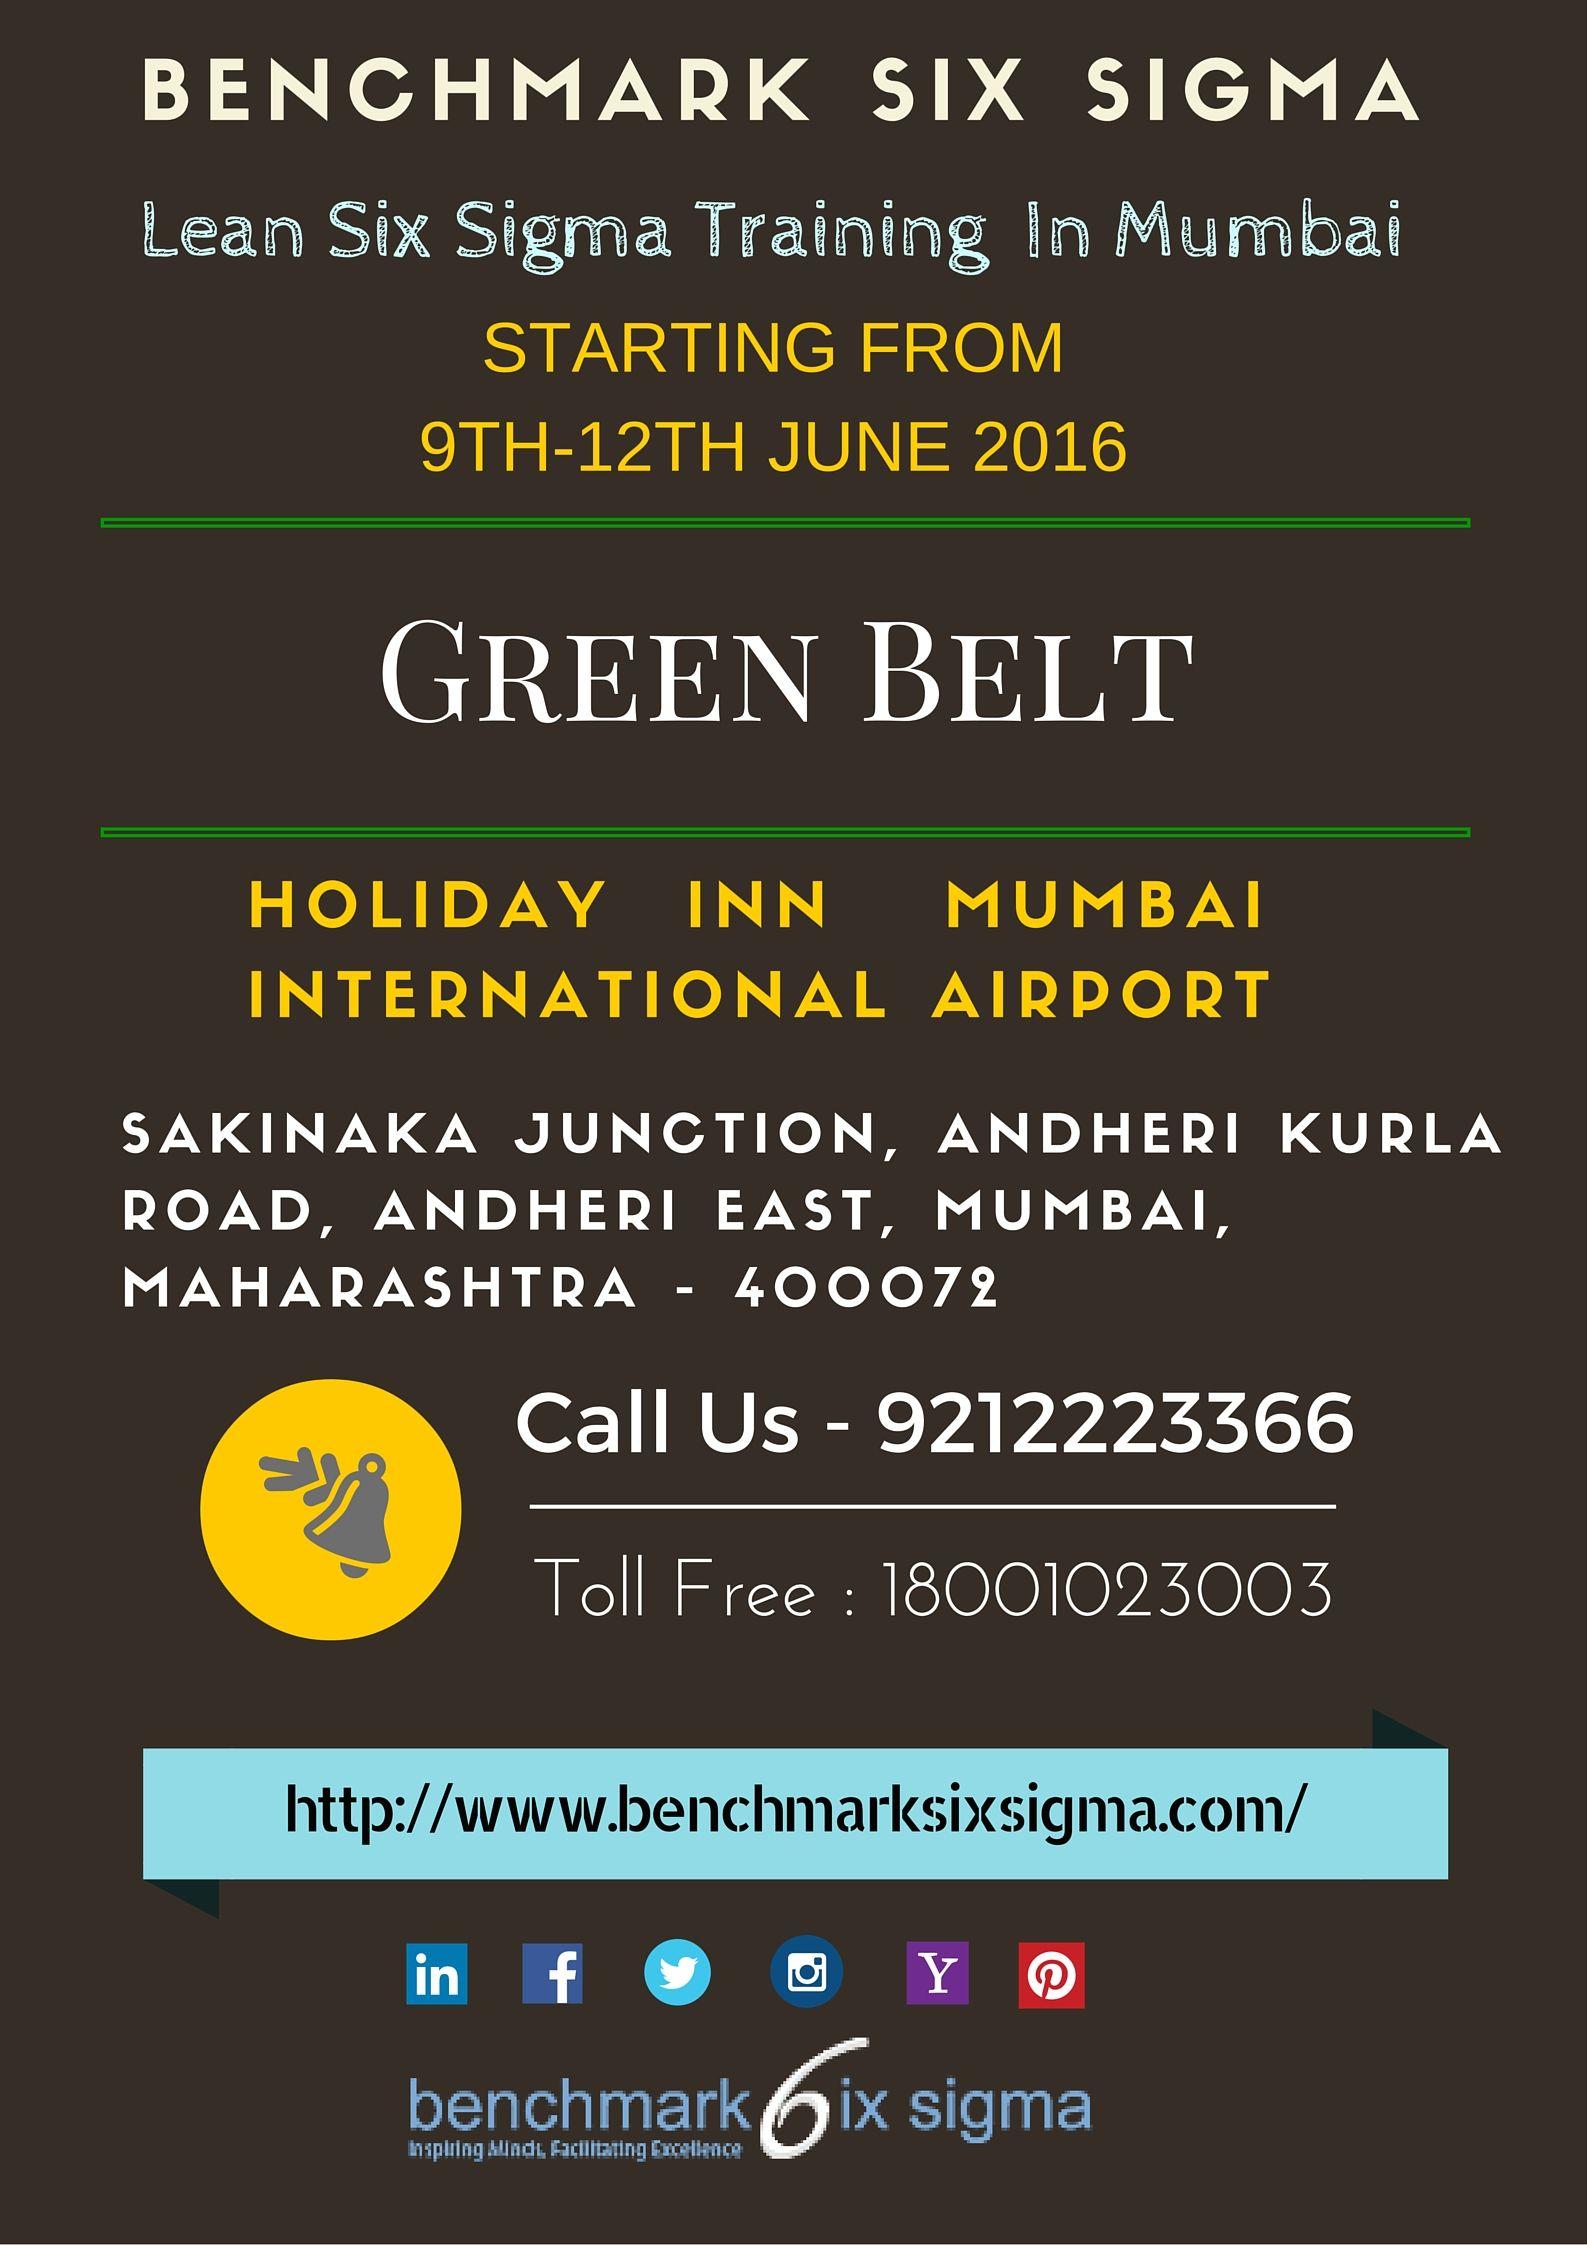 Announcing Next Lean Six Sigma Green Belt Program At Mumbai From 9th